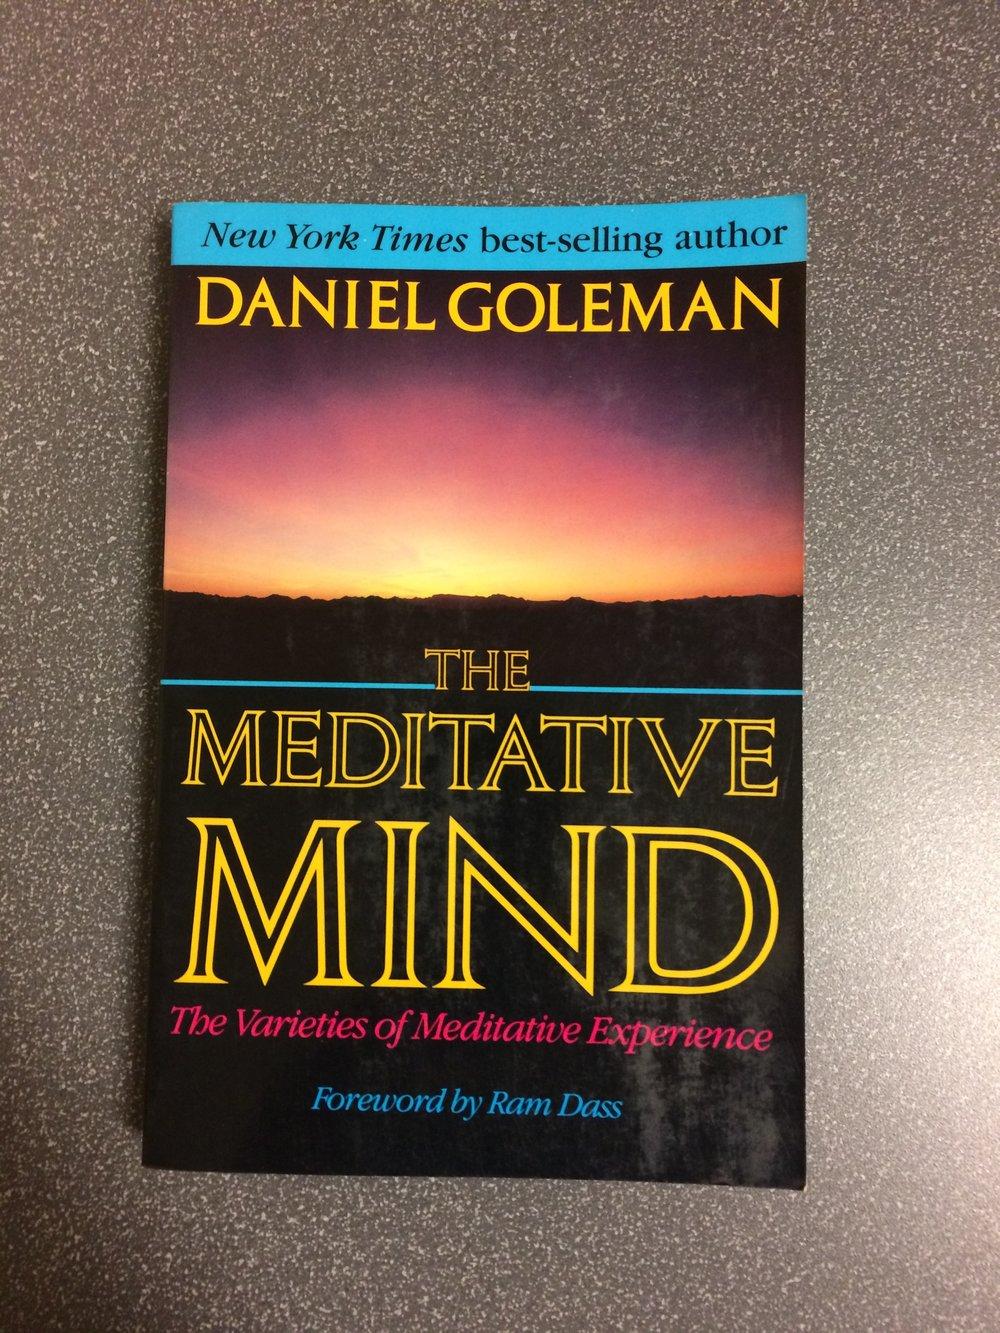 Meditative Mind.JPG